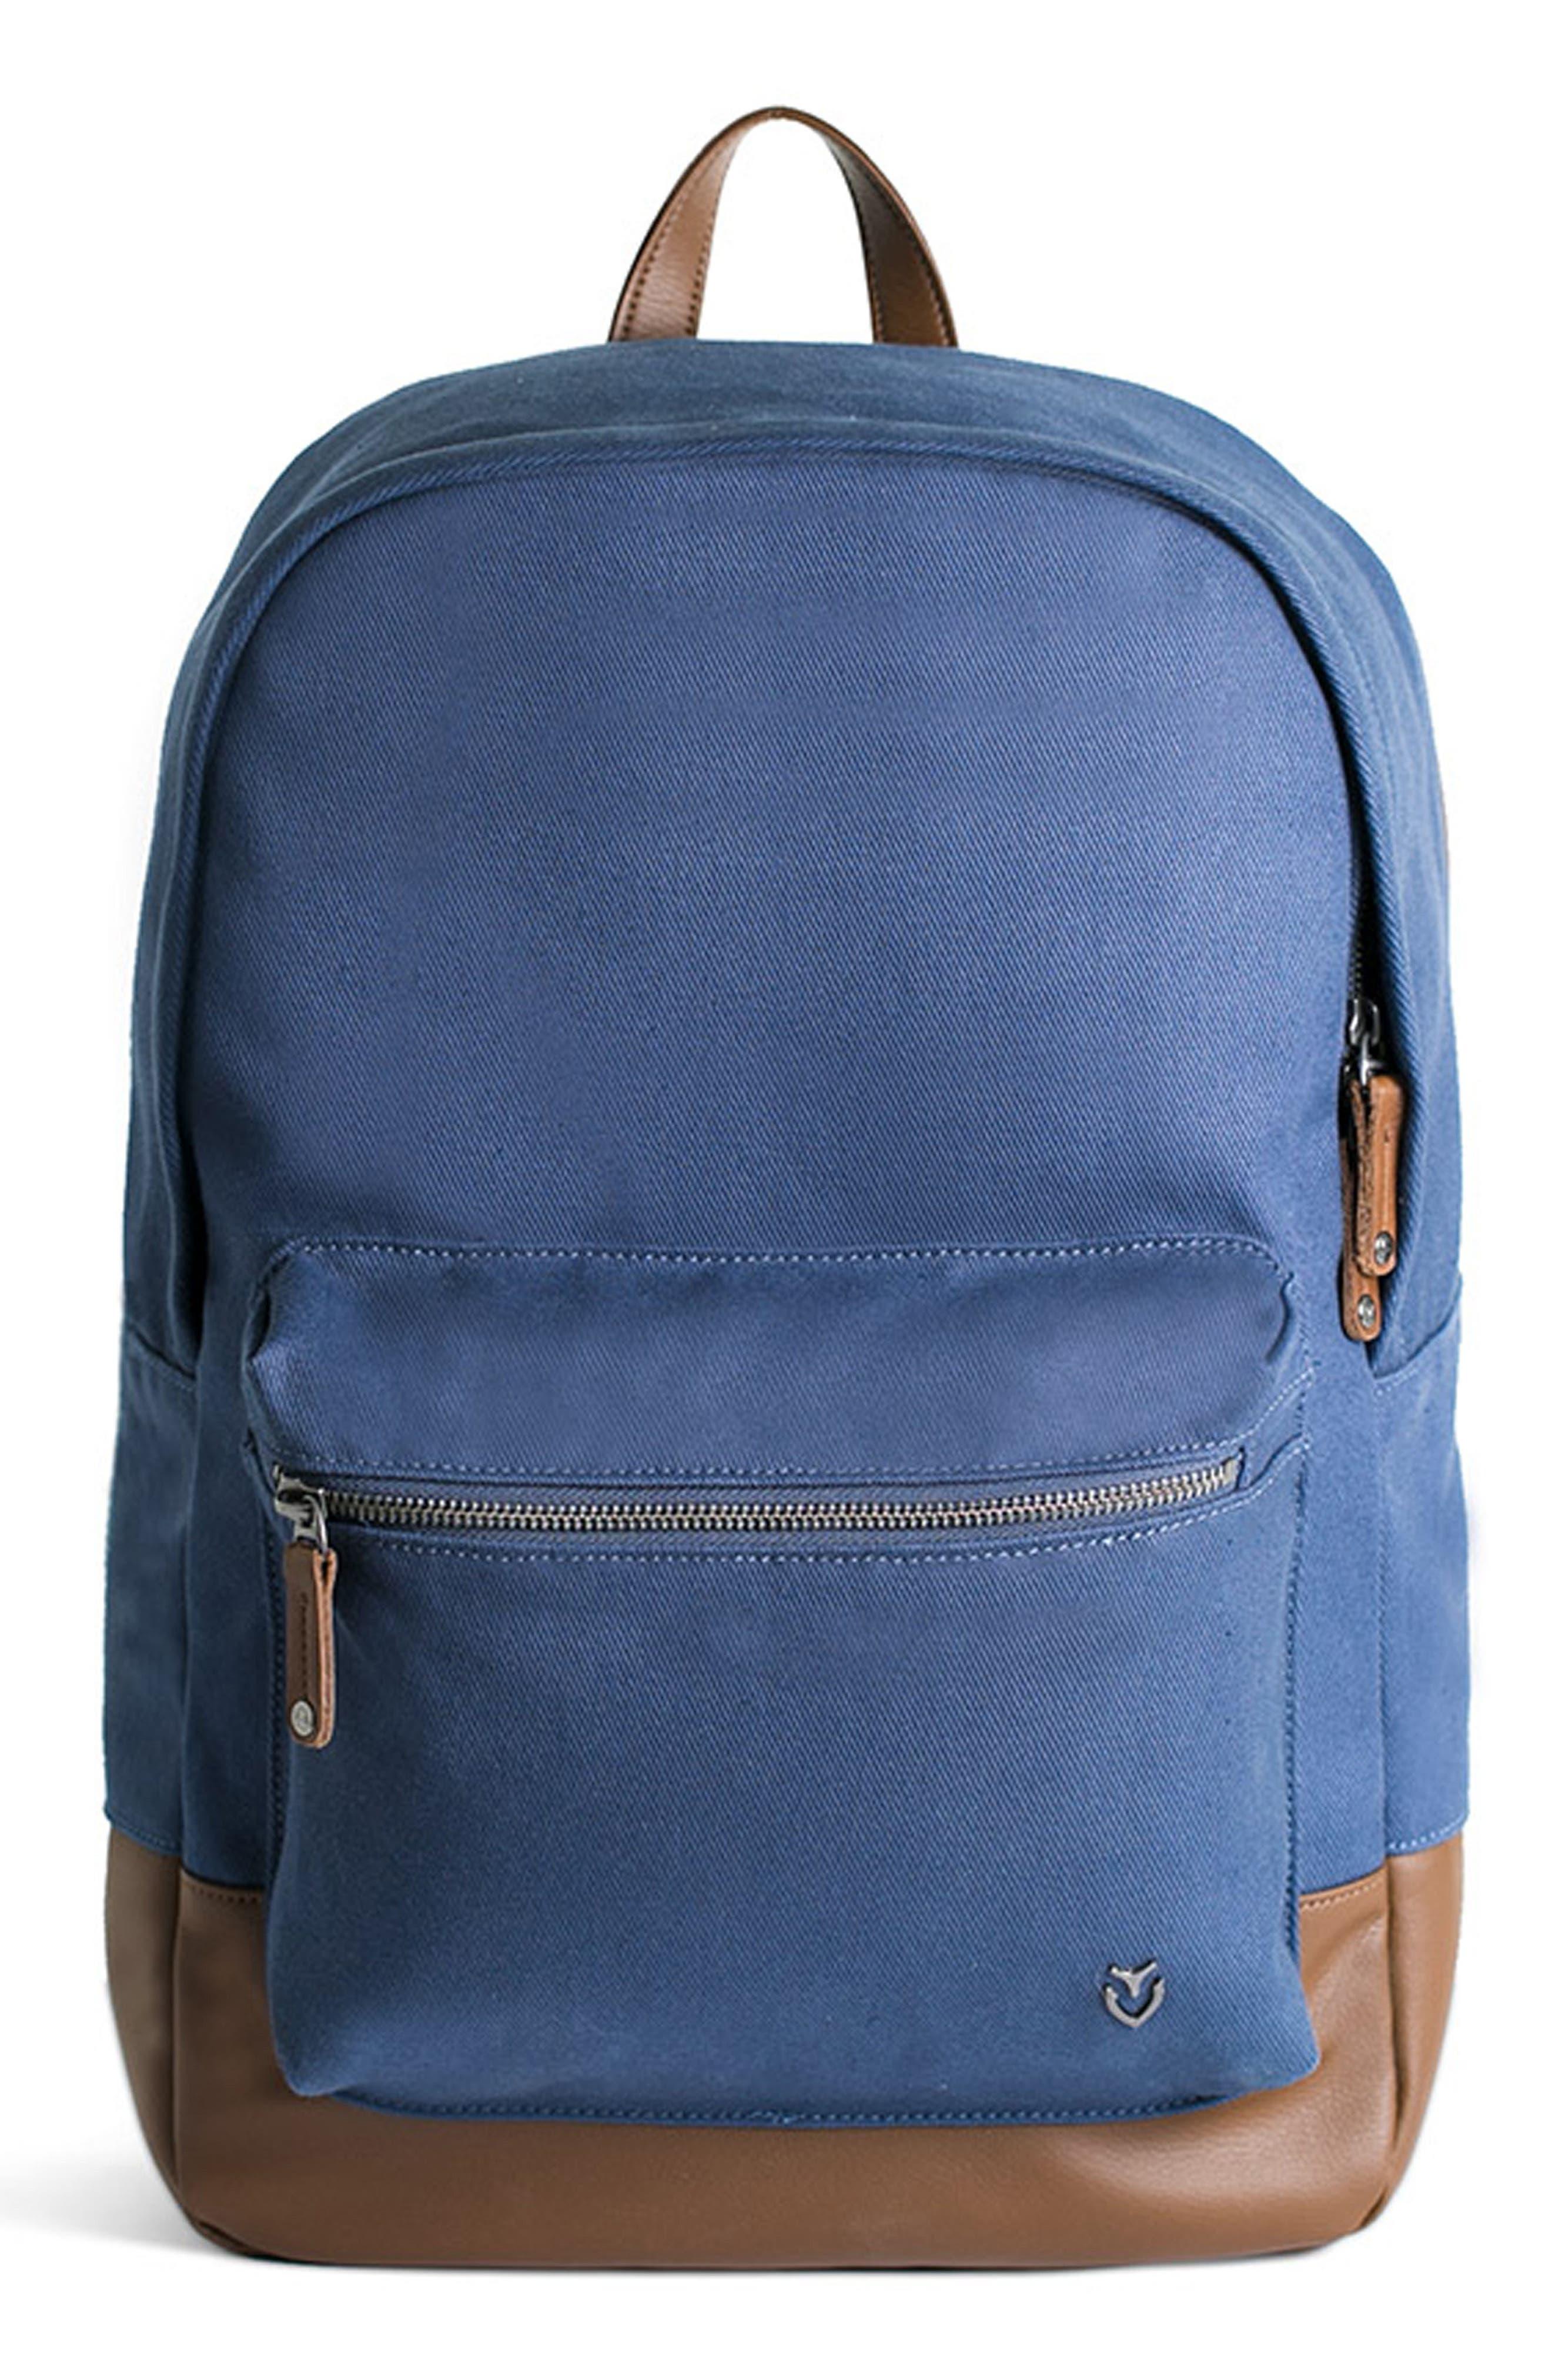 Alternate Image 1 Selected - Vessel Refined Backpack